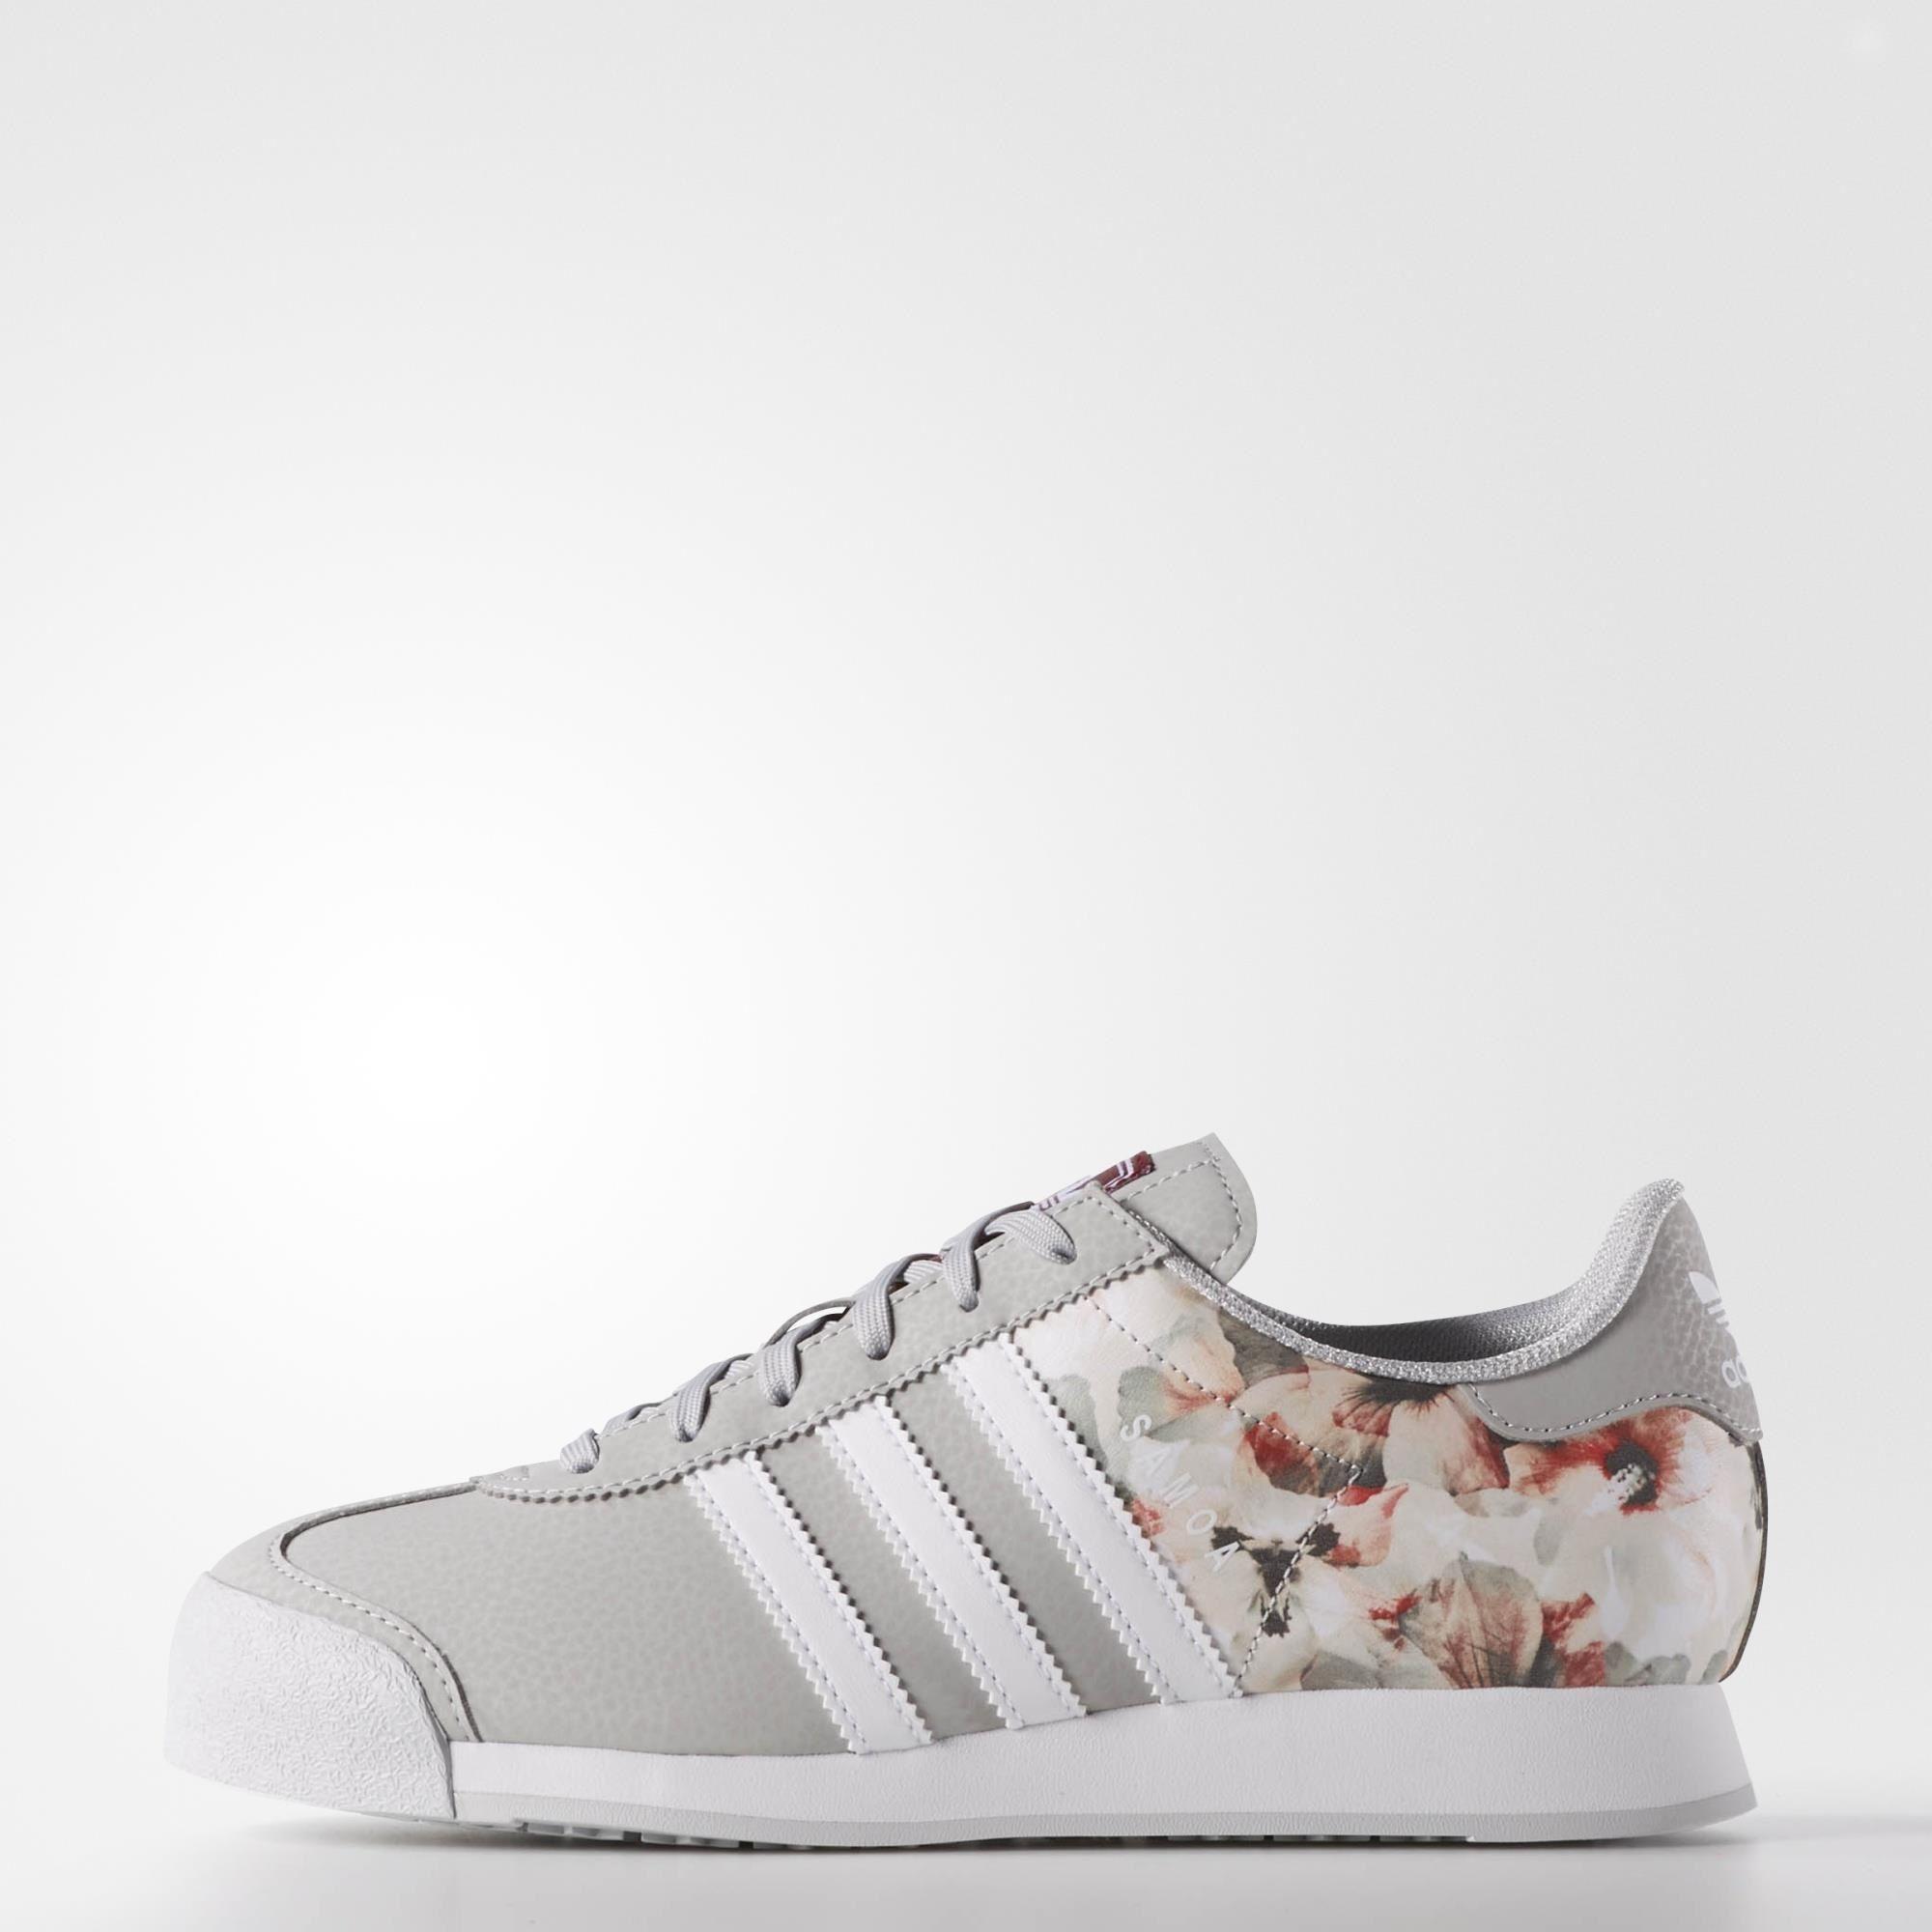 adidas womens originals shoes in adidas us